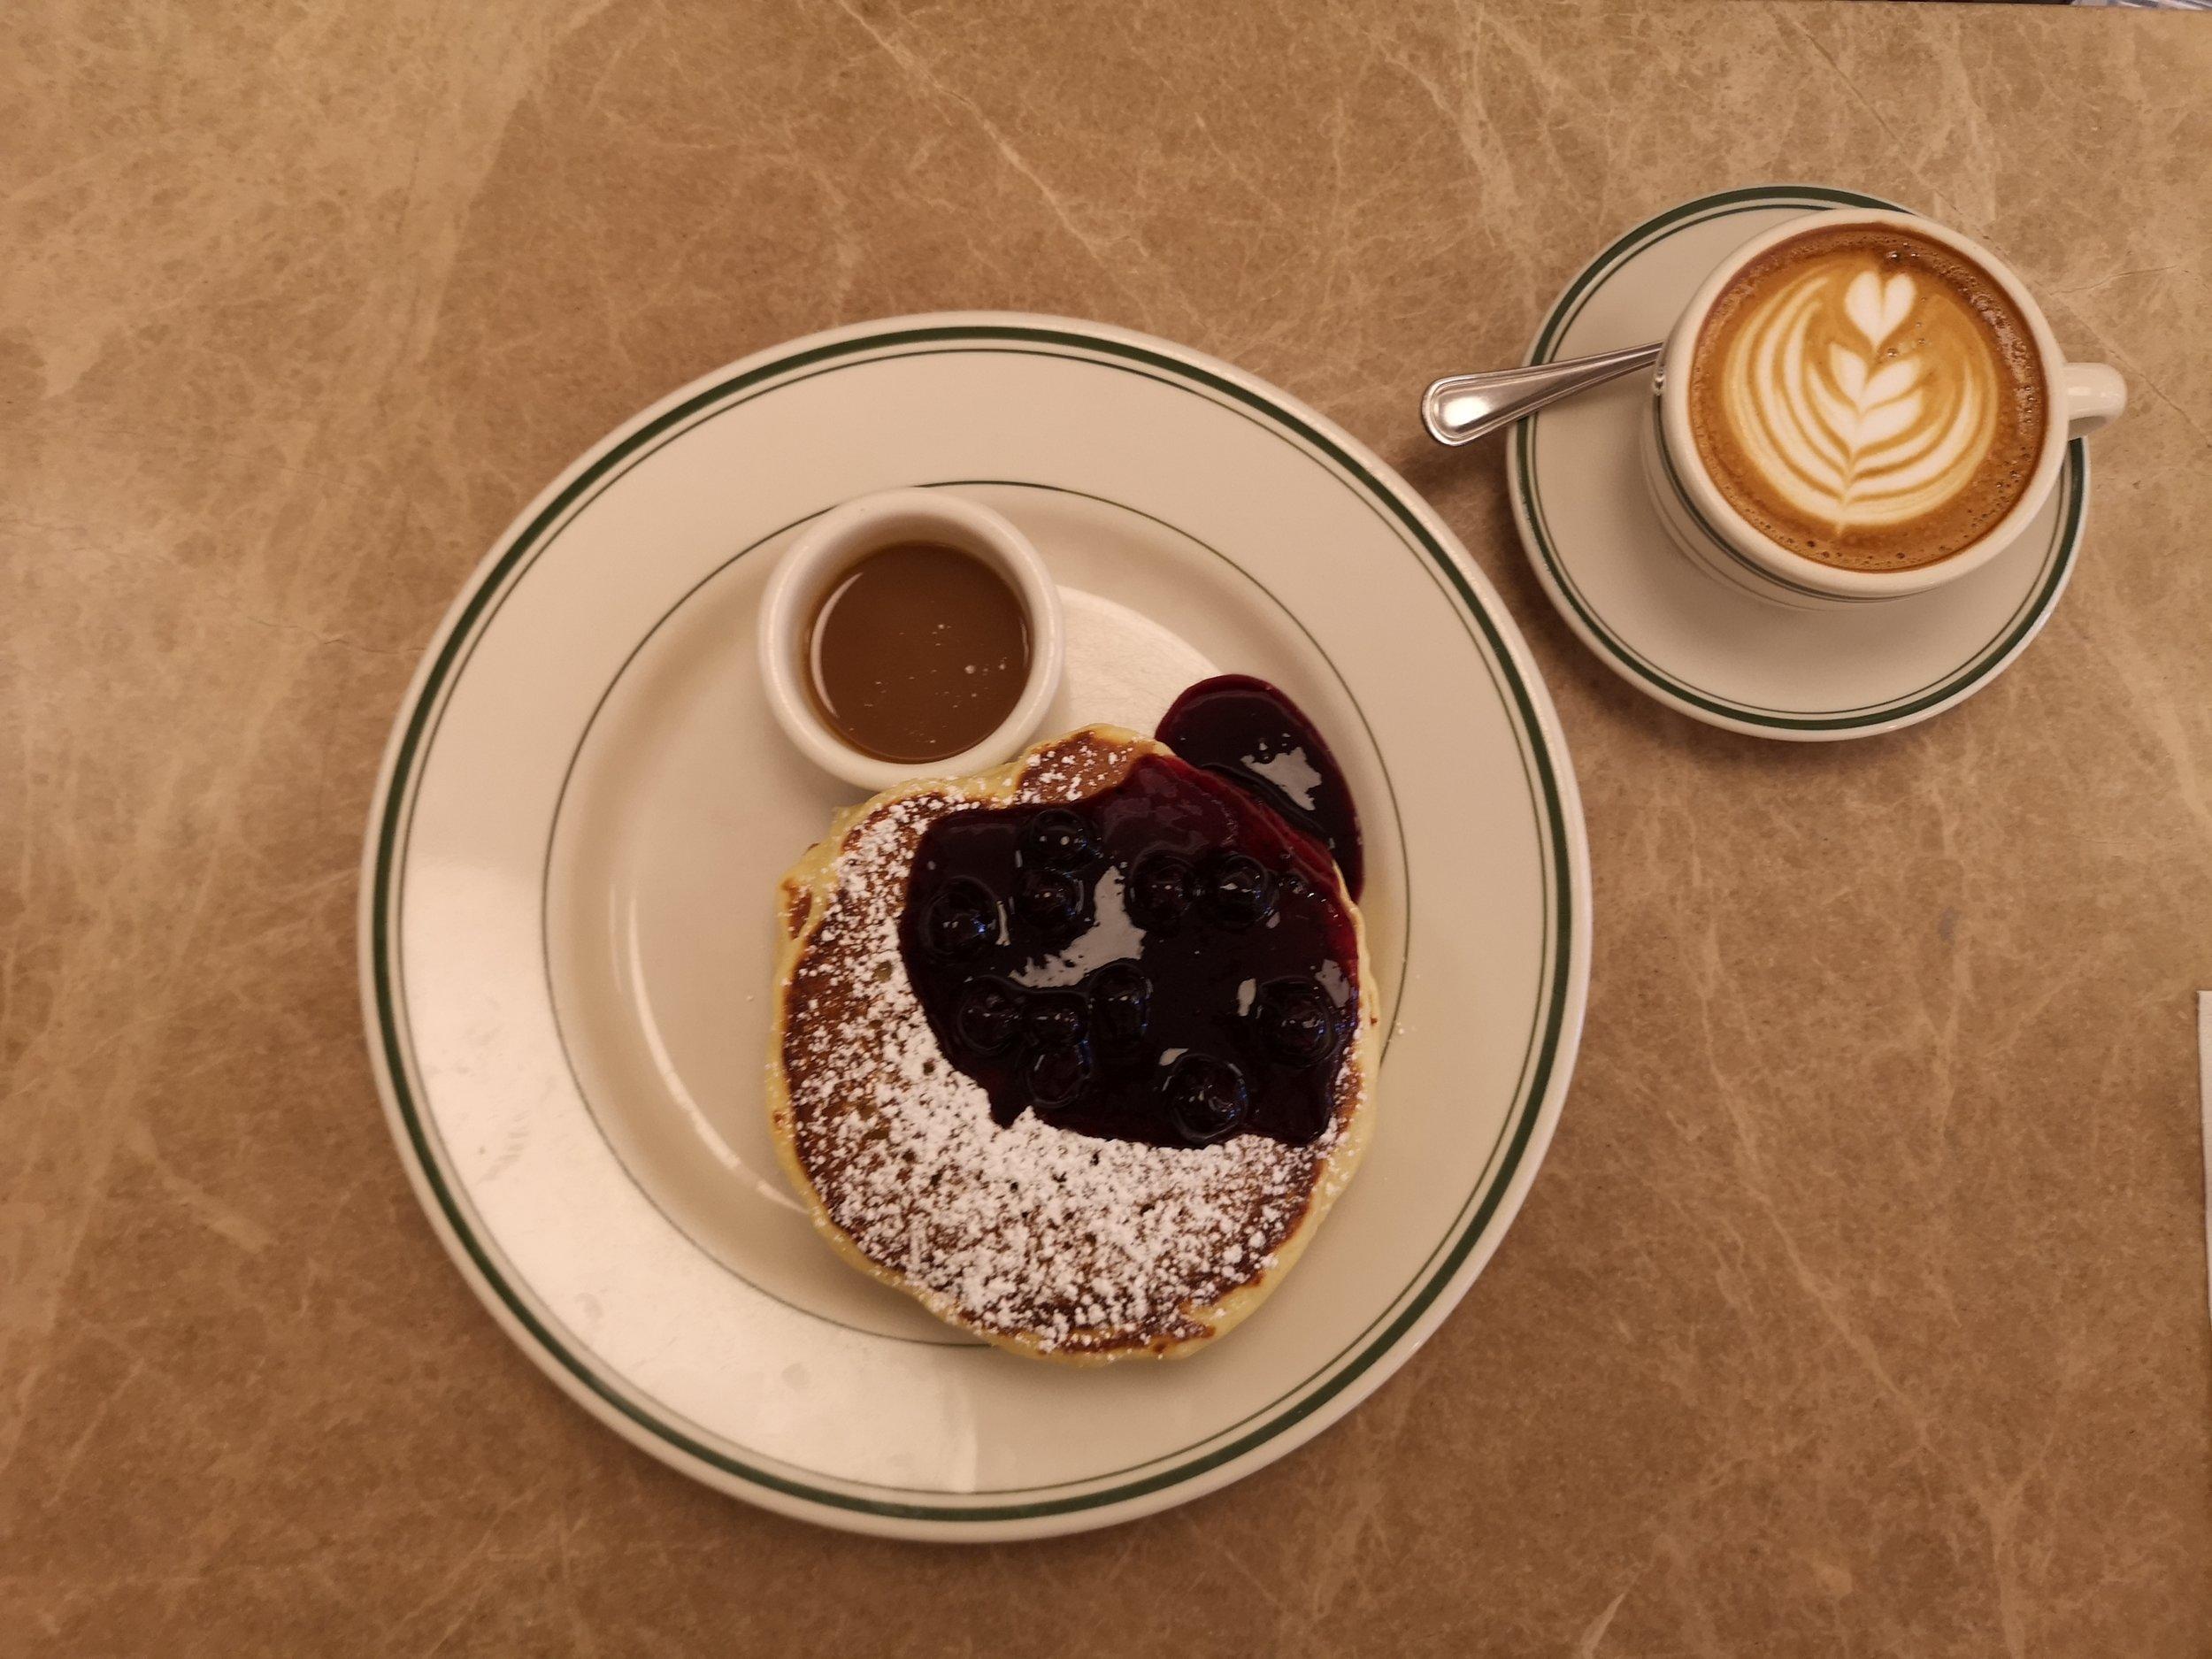 Pancake and Coffee Flatlay